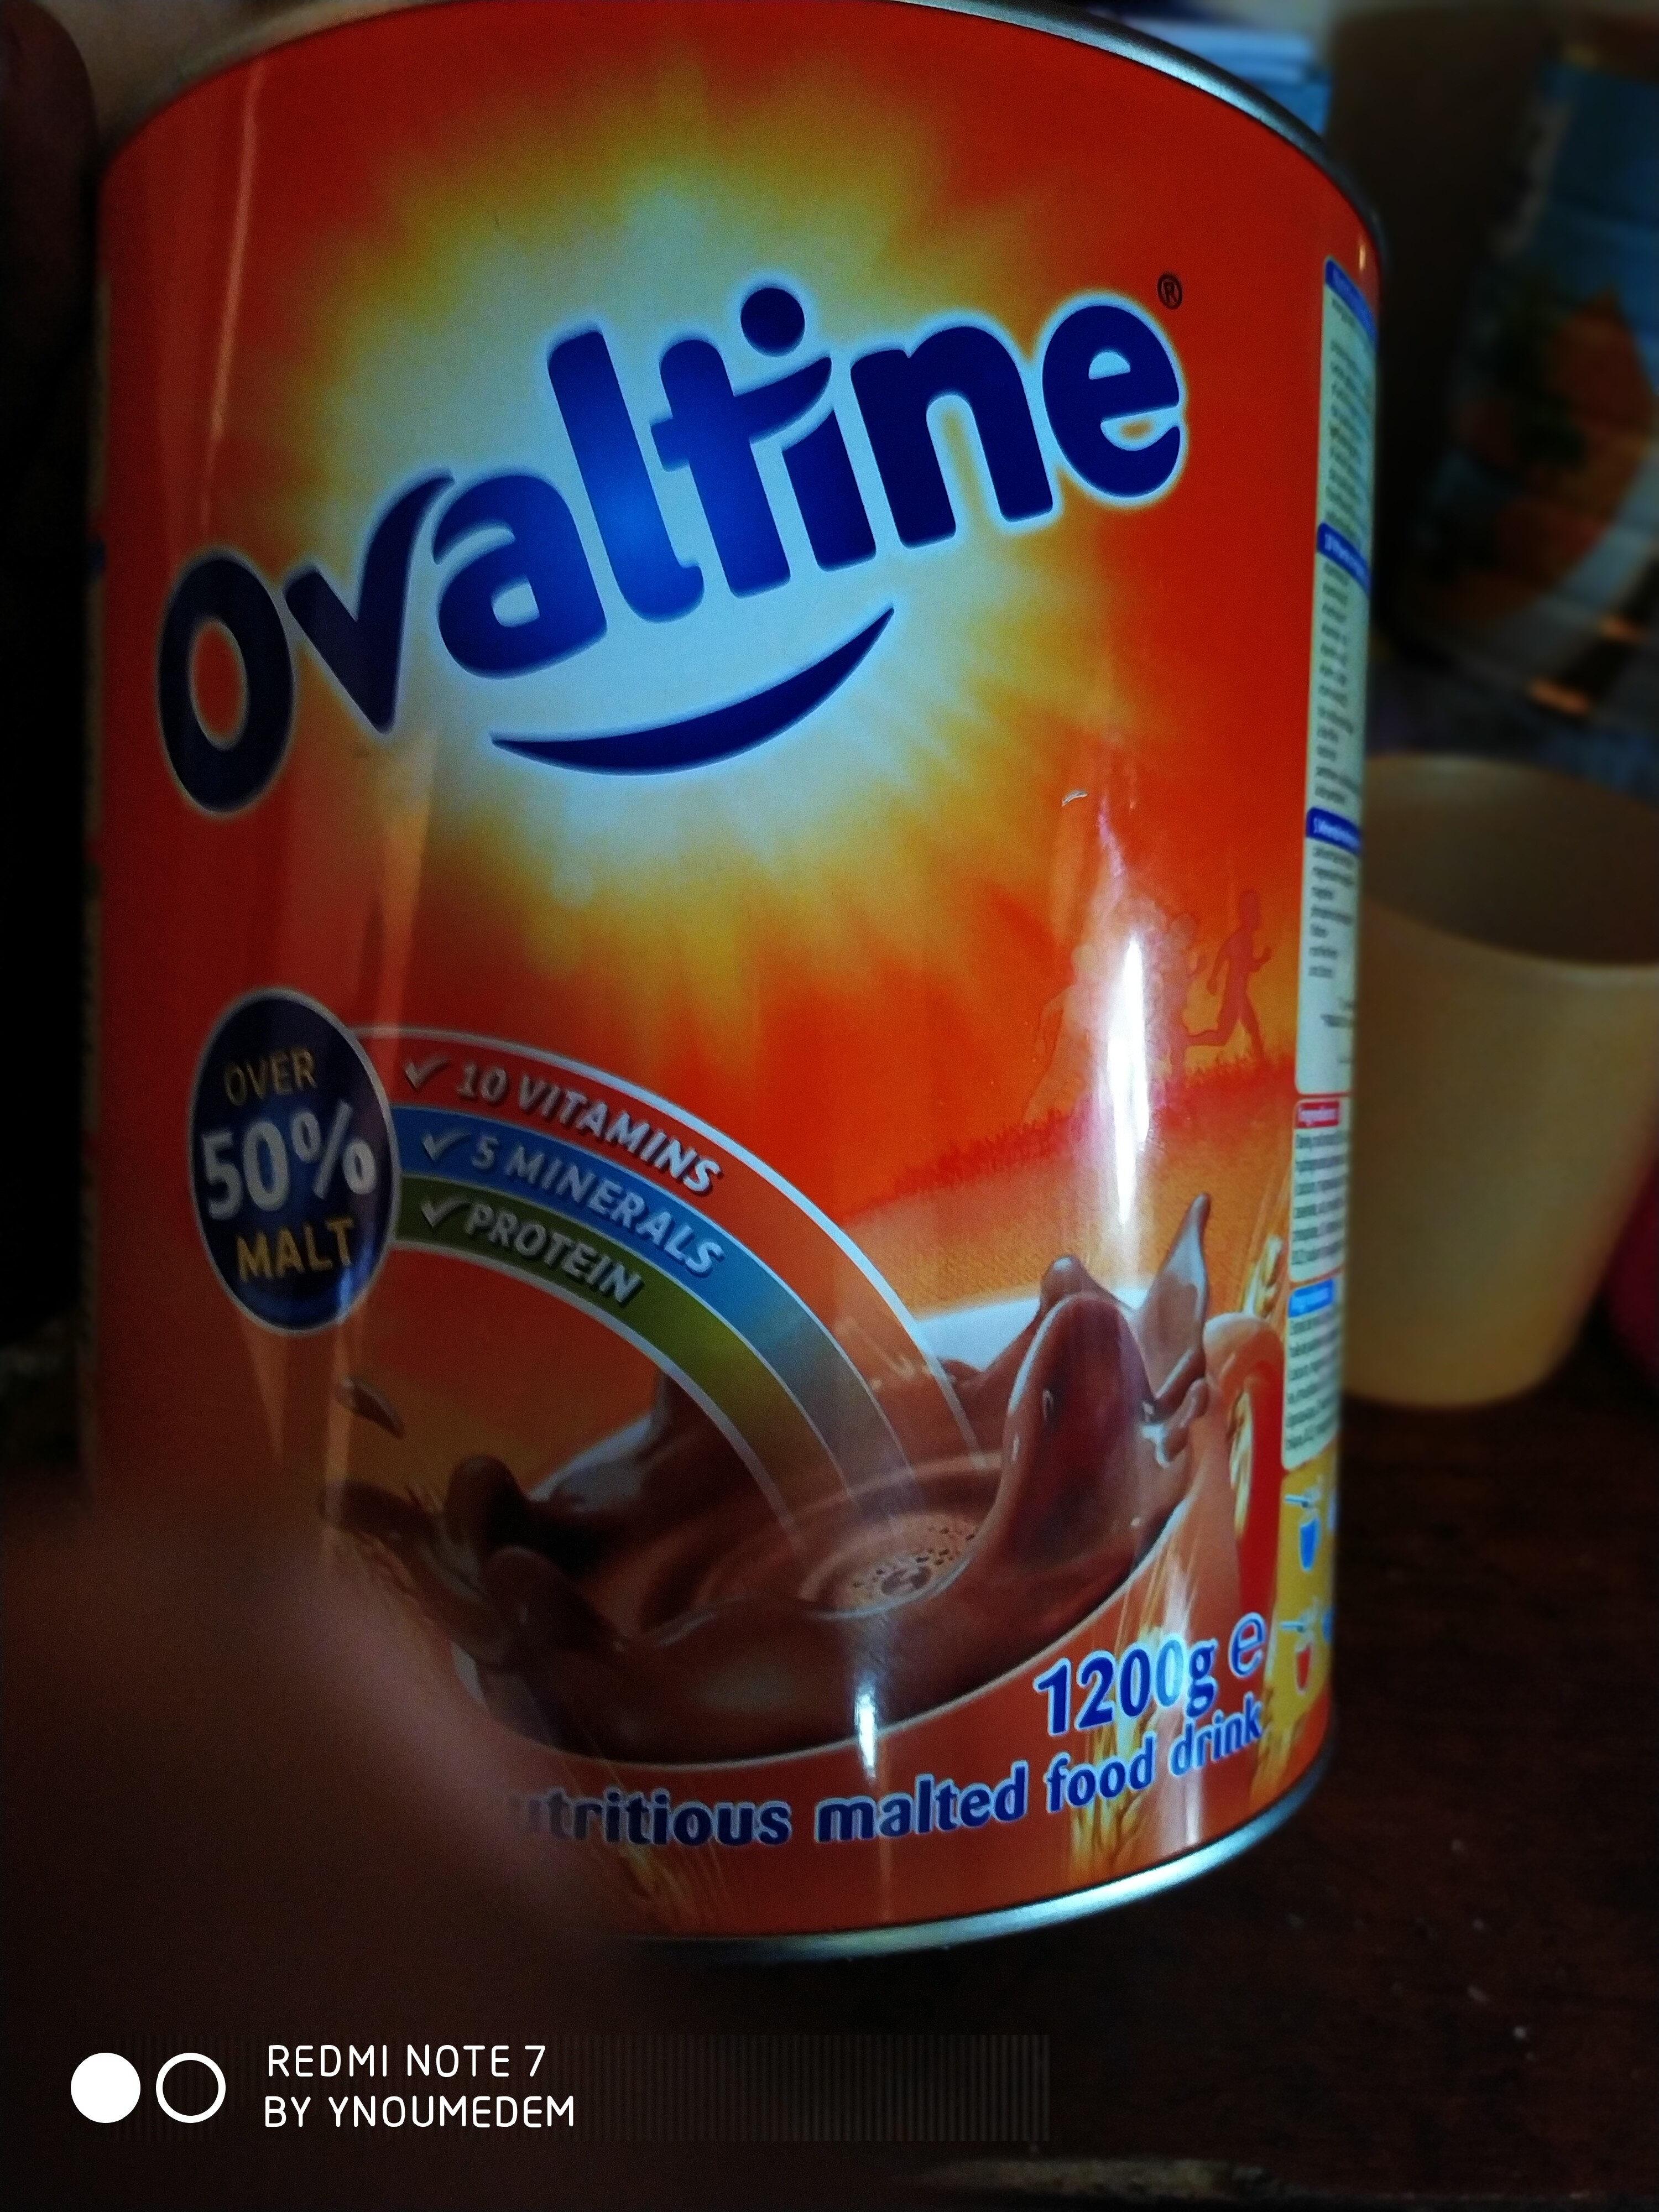 ovaltine - Produit - fr